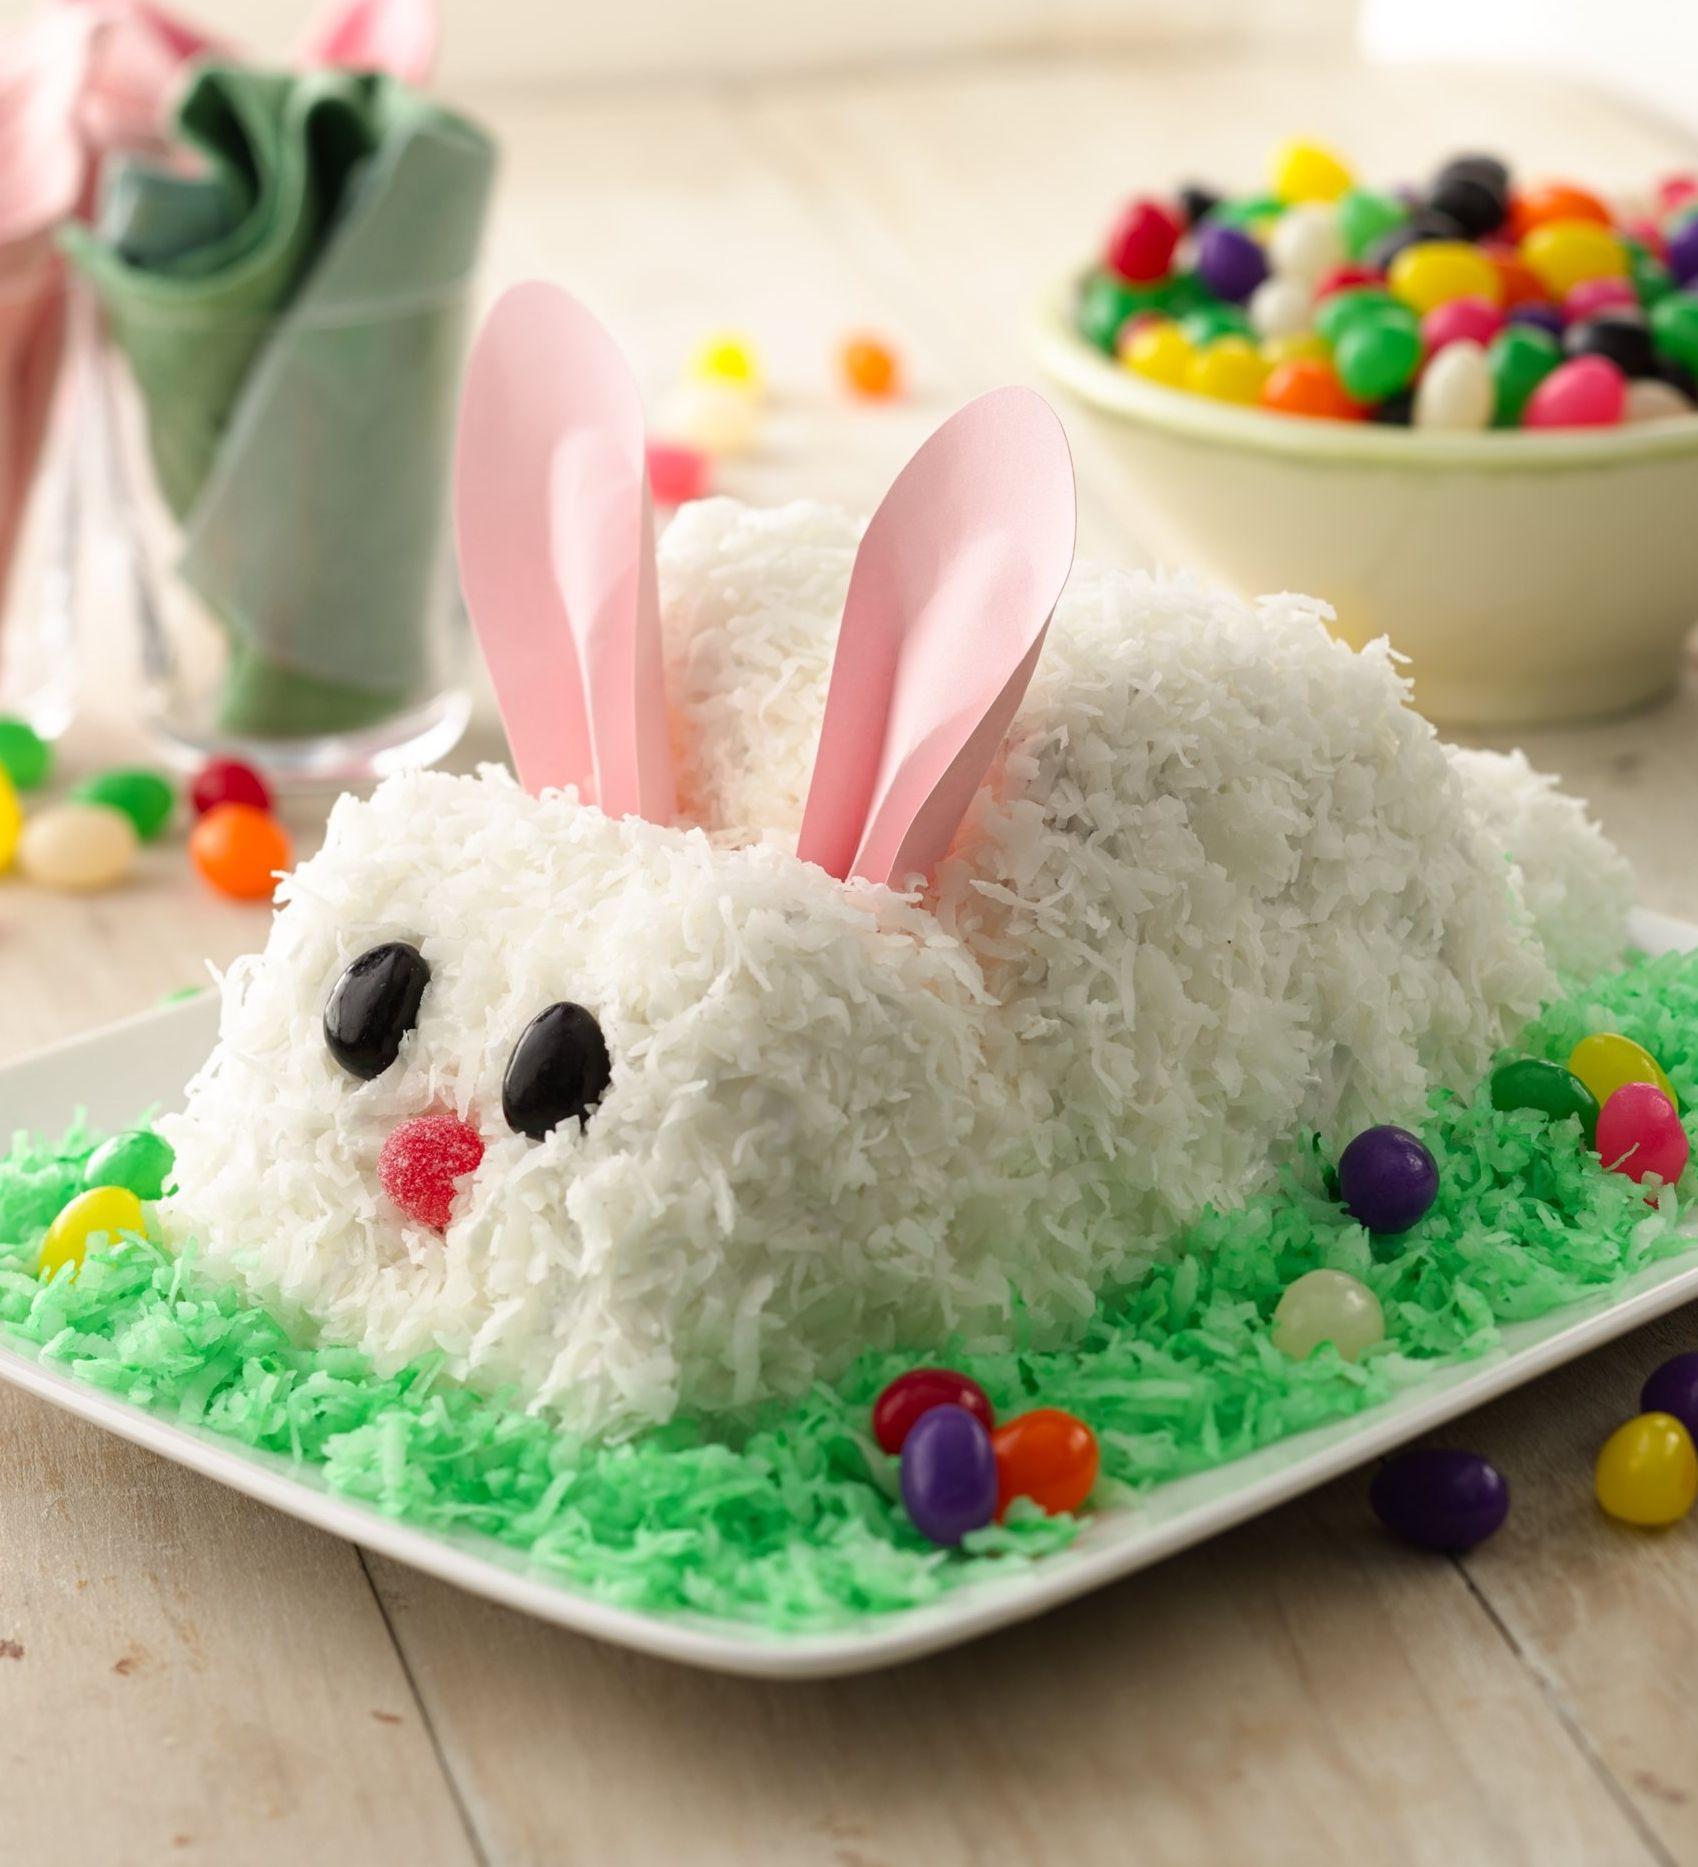 Pleasant Easter Bunny Cake Recipe Easter Bunny Cake Rabbit Cake Funny Birthday Cards Online Elaedamsfinfo